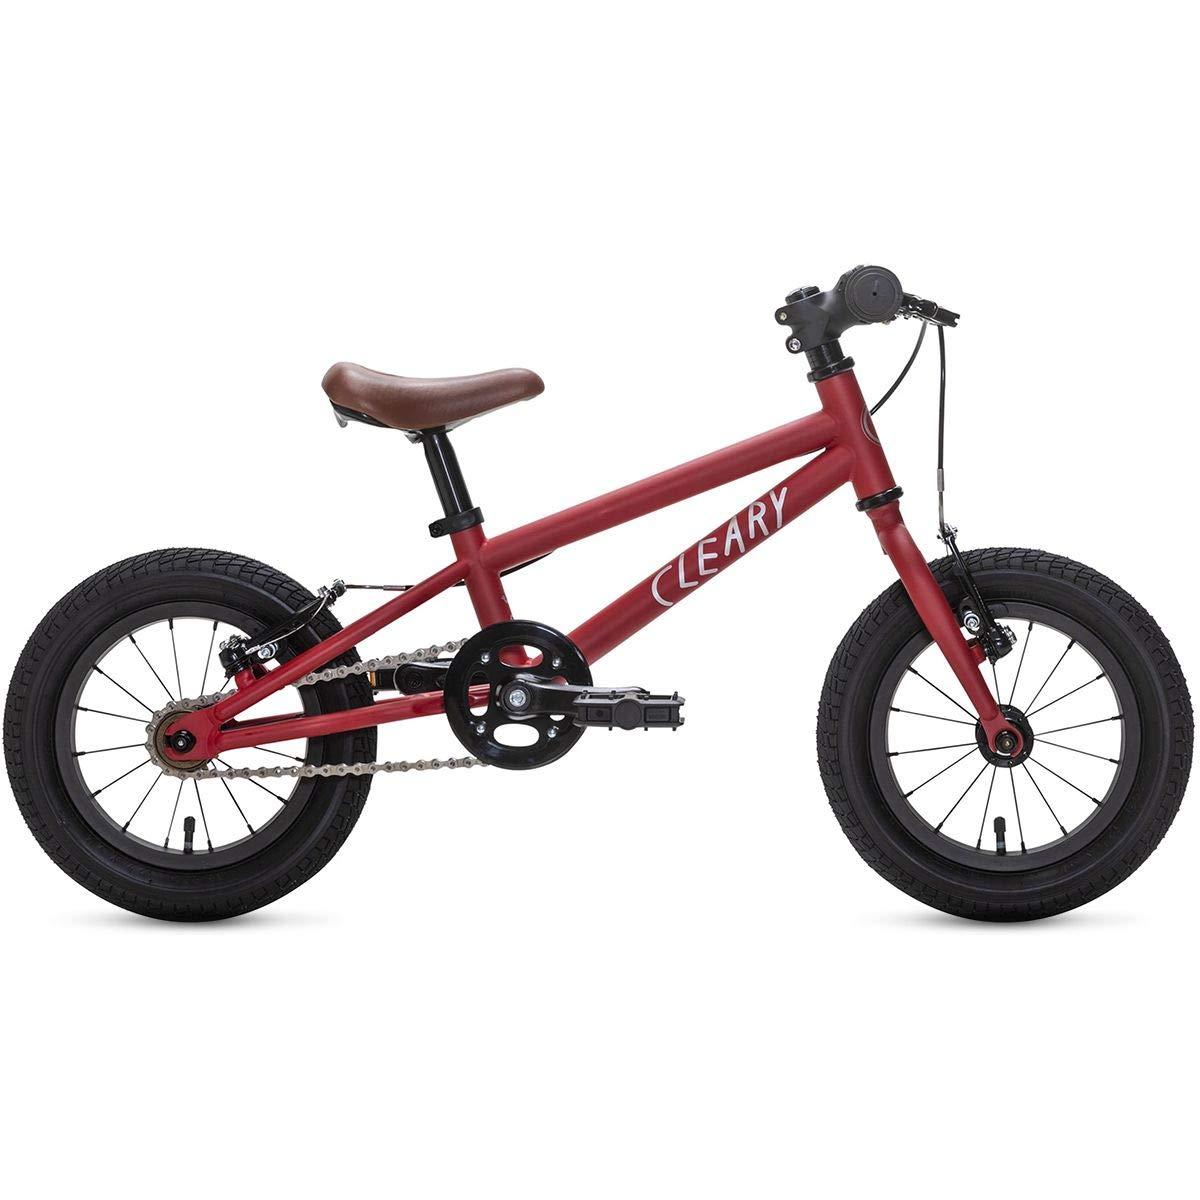 Cleary Bikes Gecko 12in Single Speed Freewheel Bike – Kids